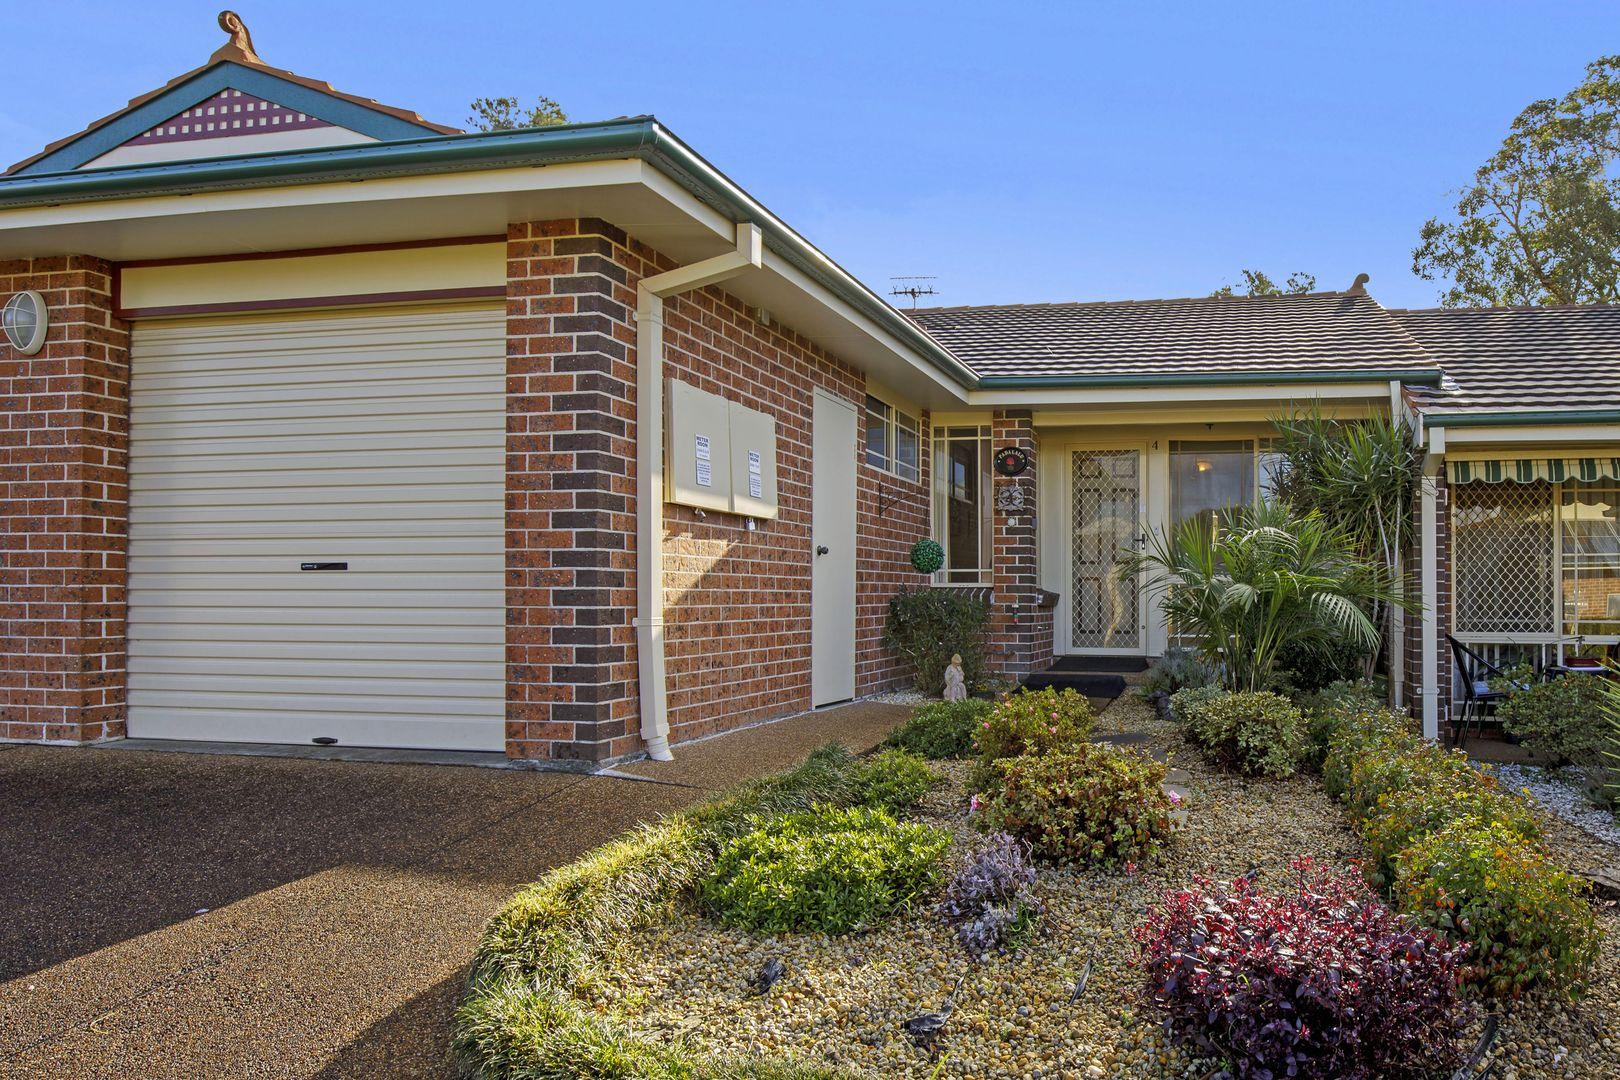 4/4 Beryl Street, Gorokan NSW 2263, Image 0